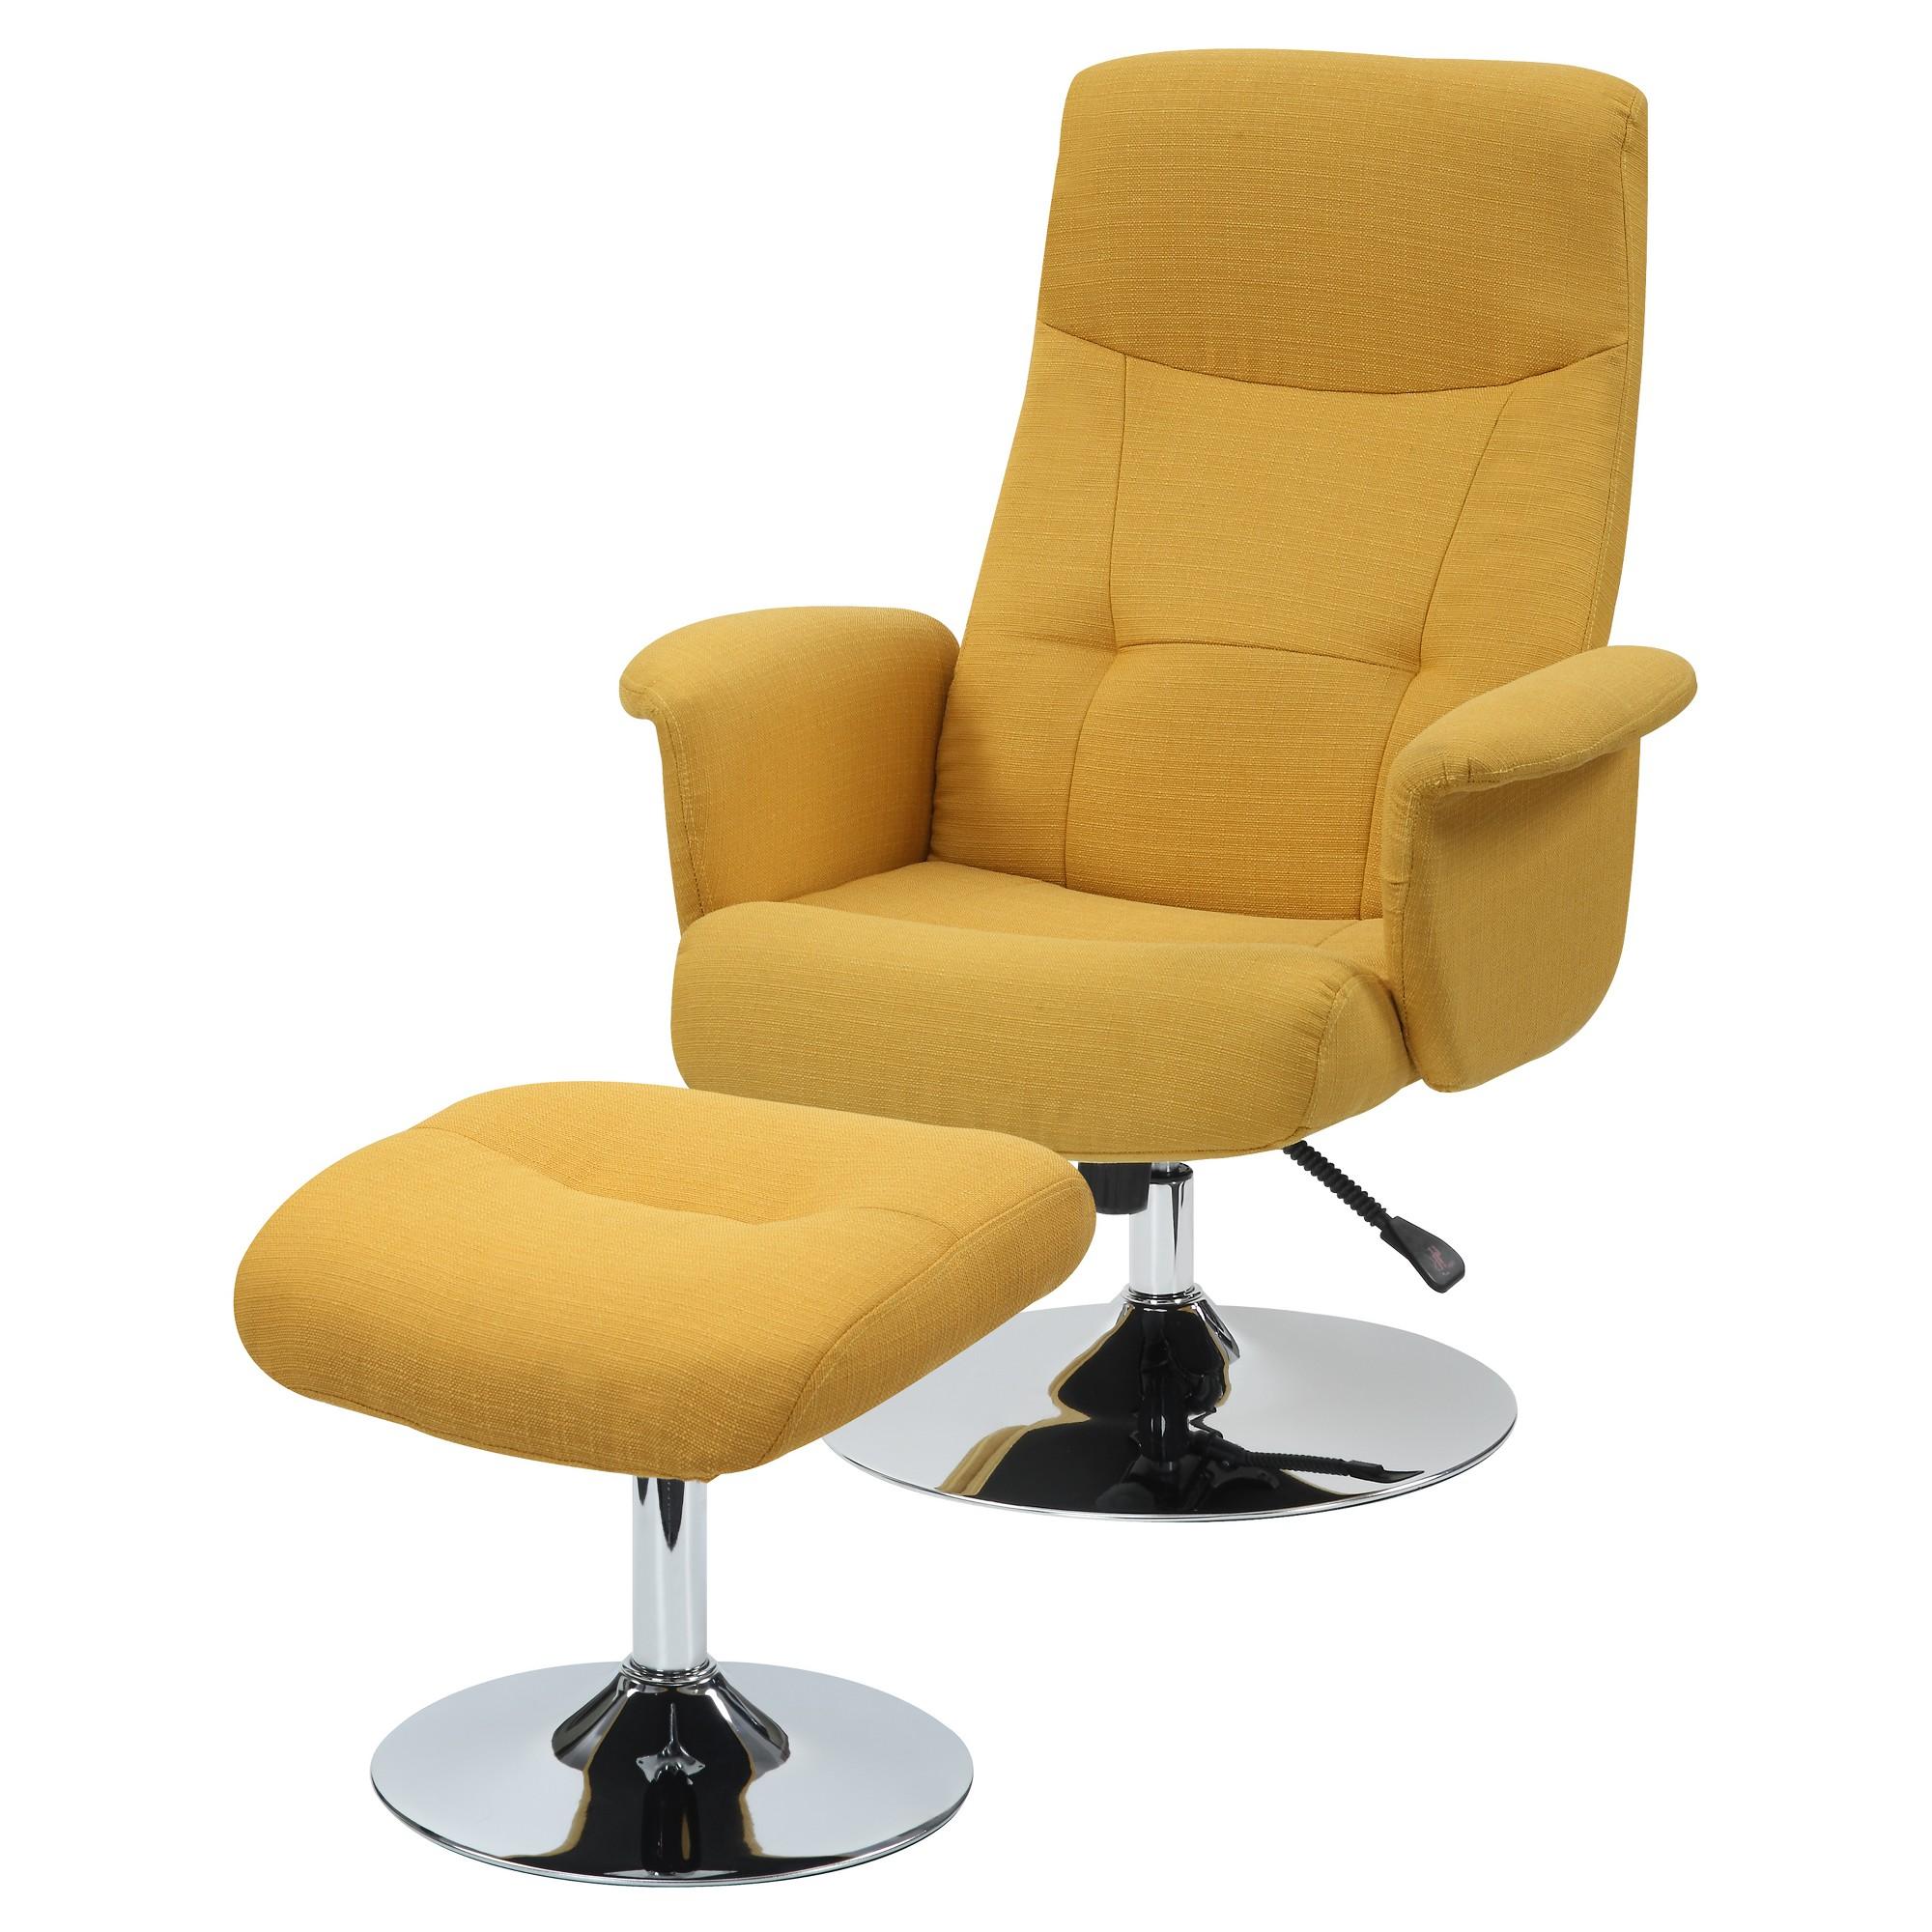 dallas chair and ottoman  mustard yellow  handy living